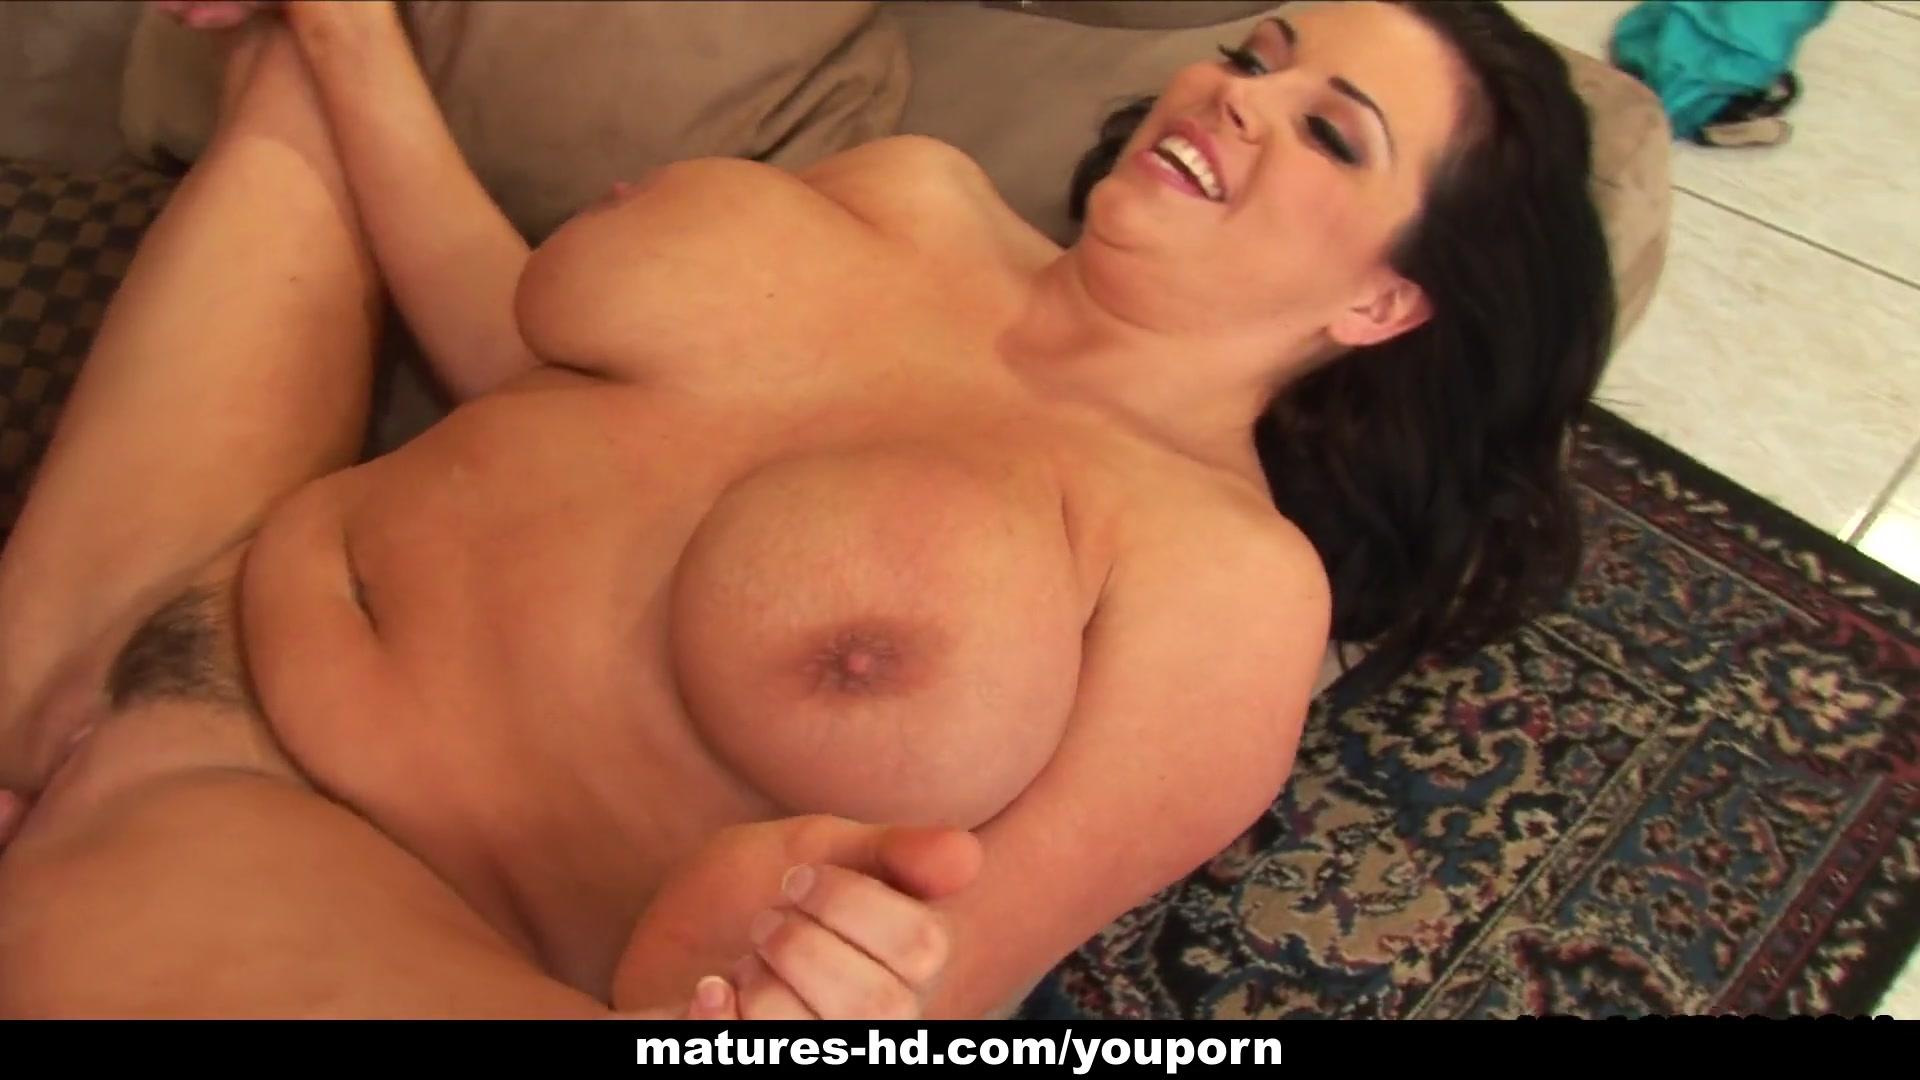 Sara jay huge tits oiled and fucked